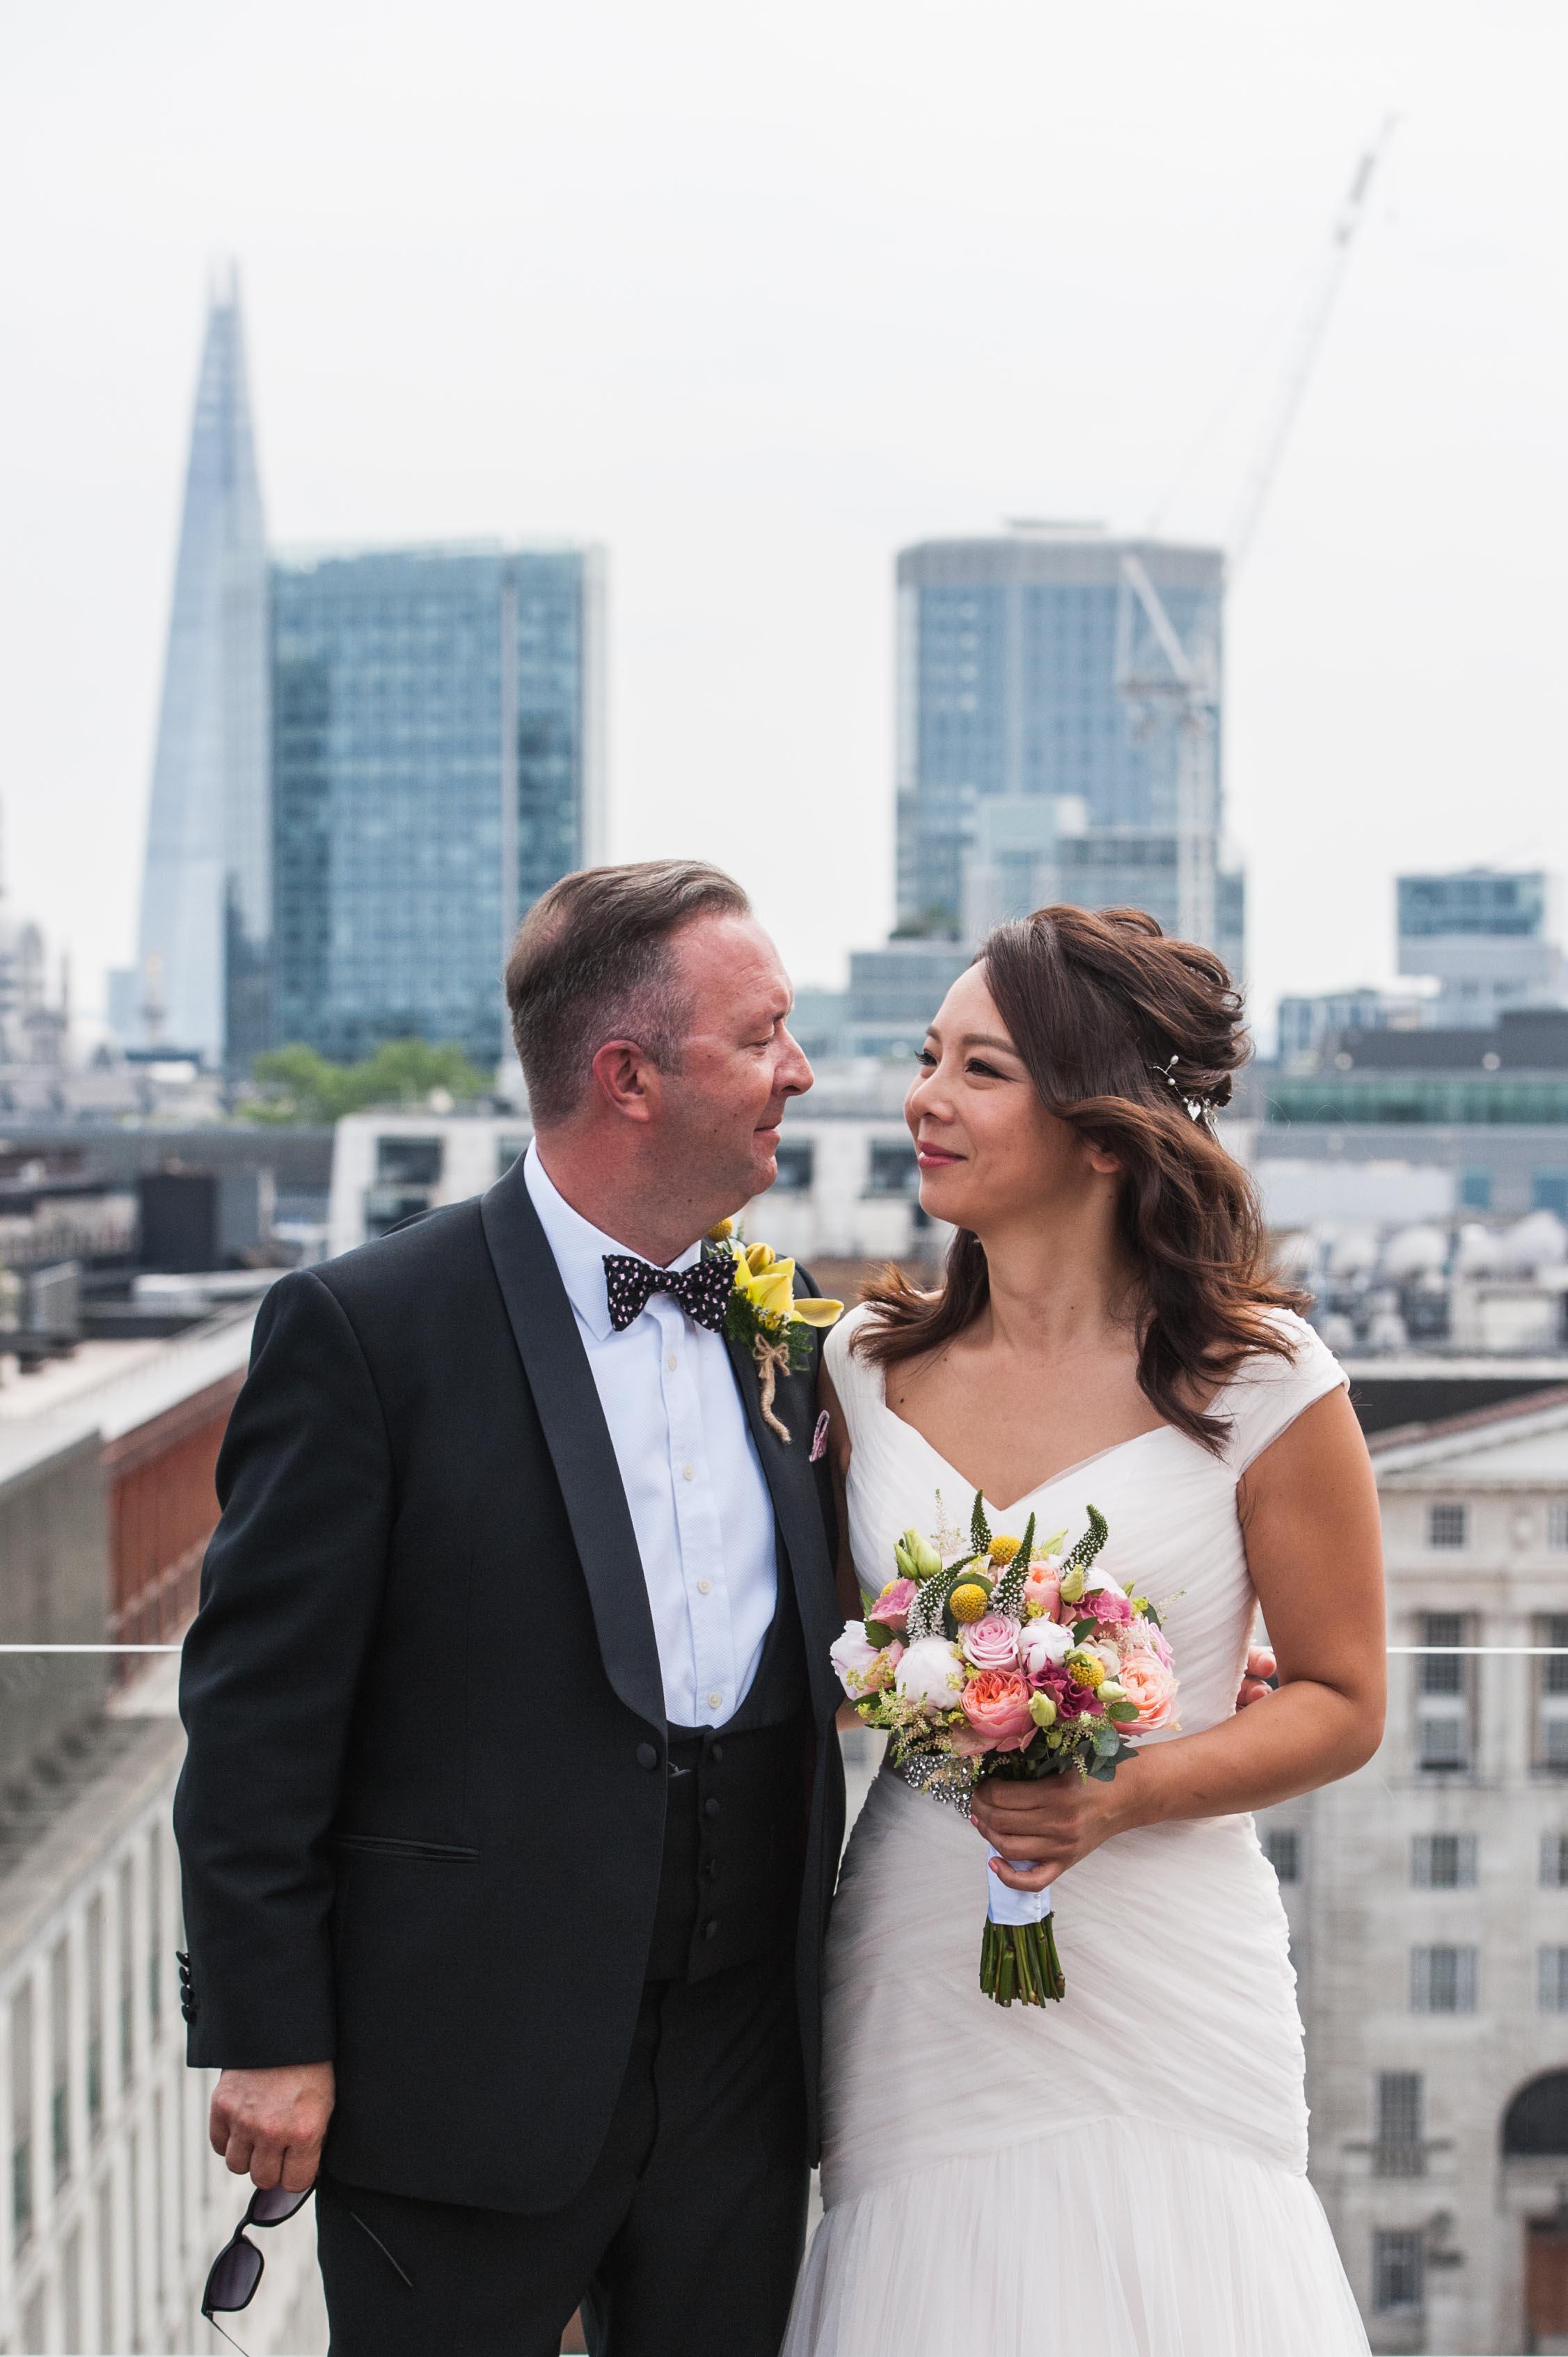 D&M_Marylebone Town Hall Wedding (39 of 239).jpg